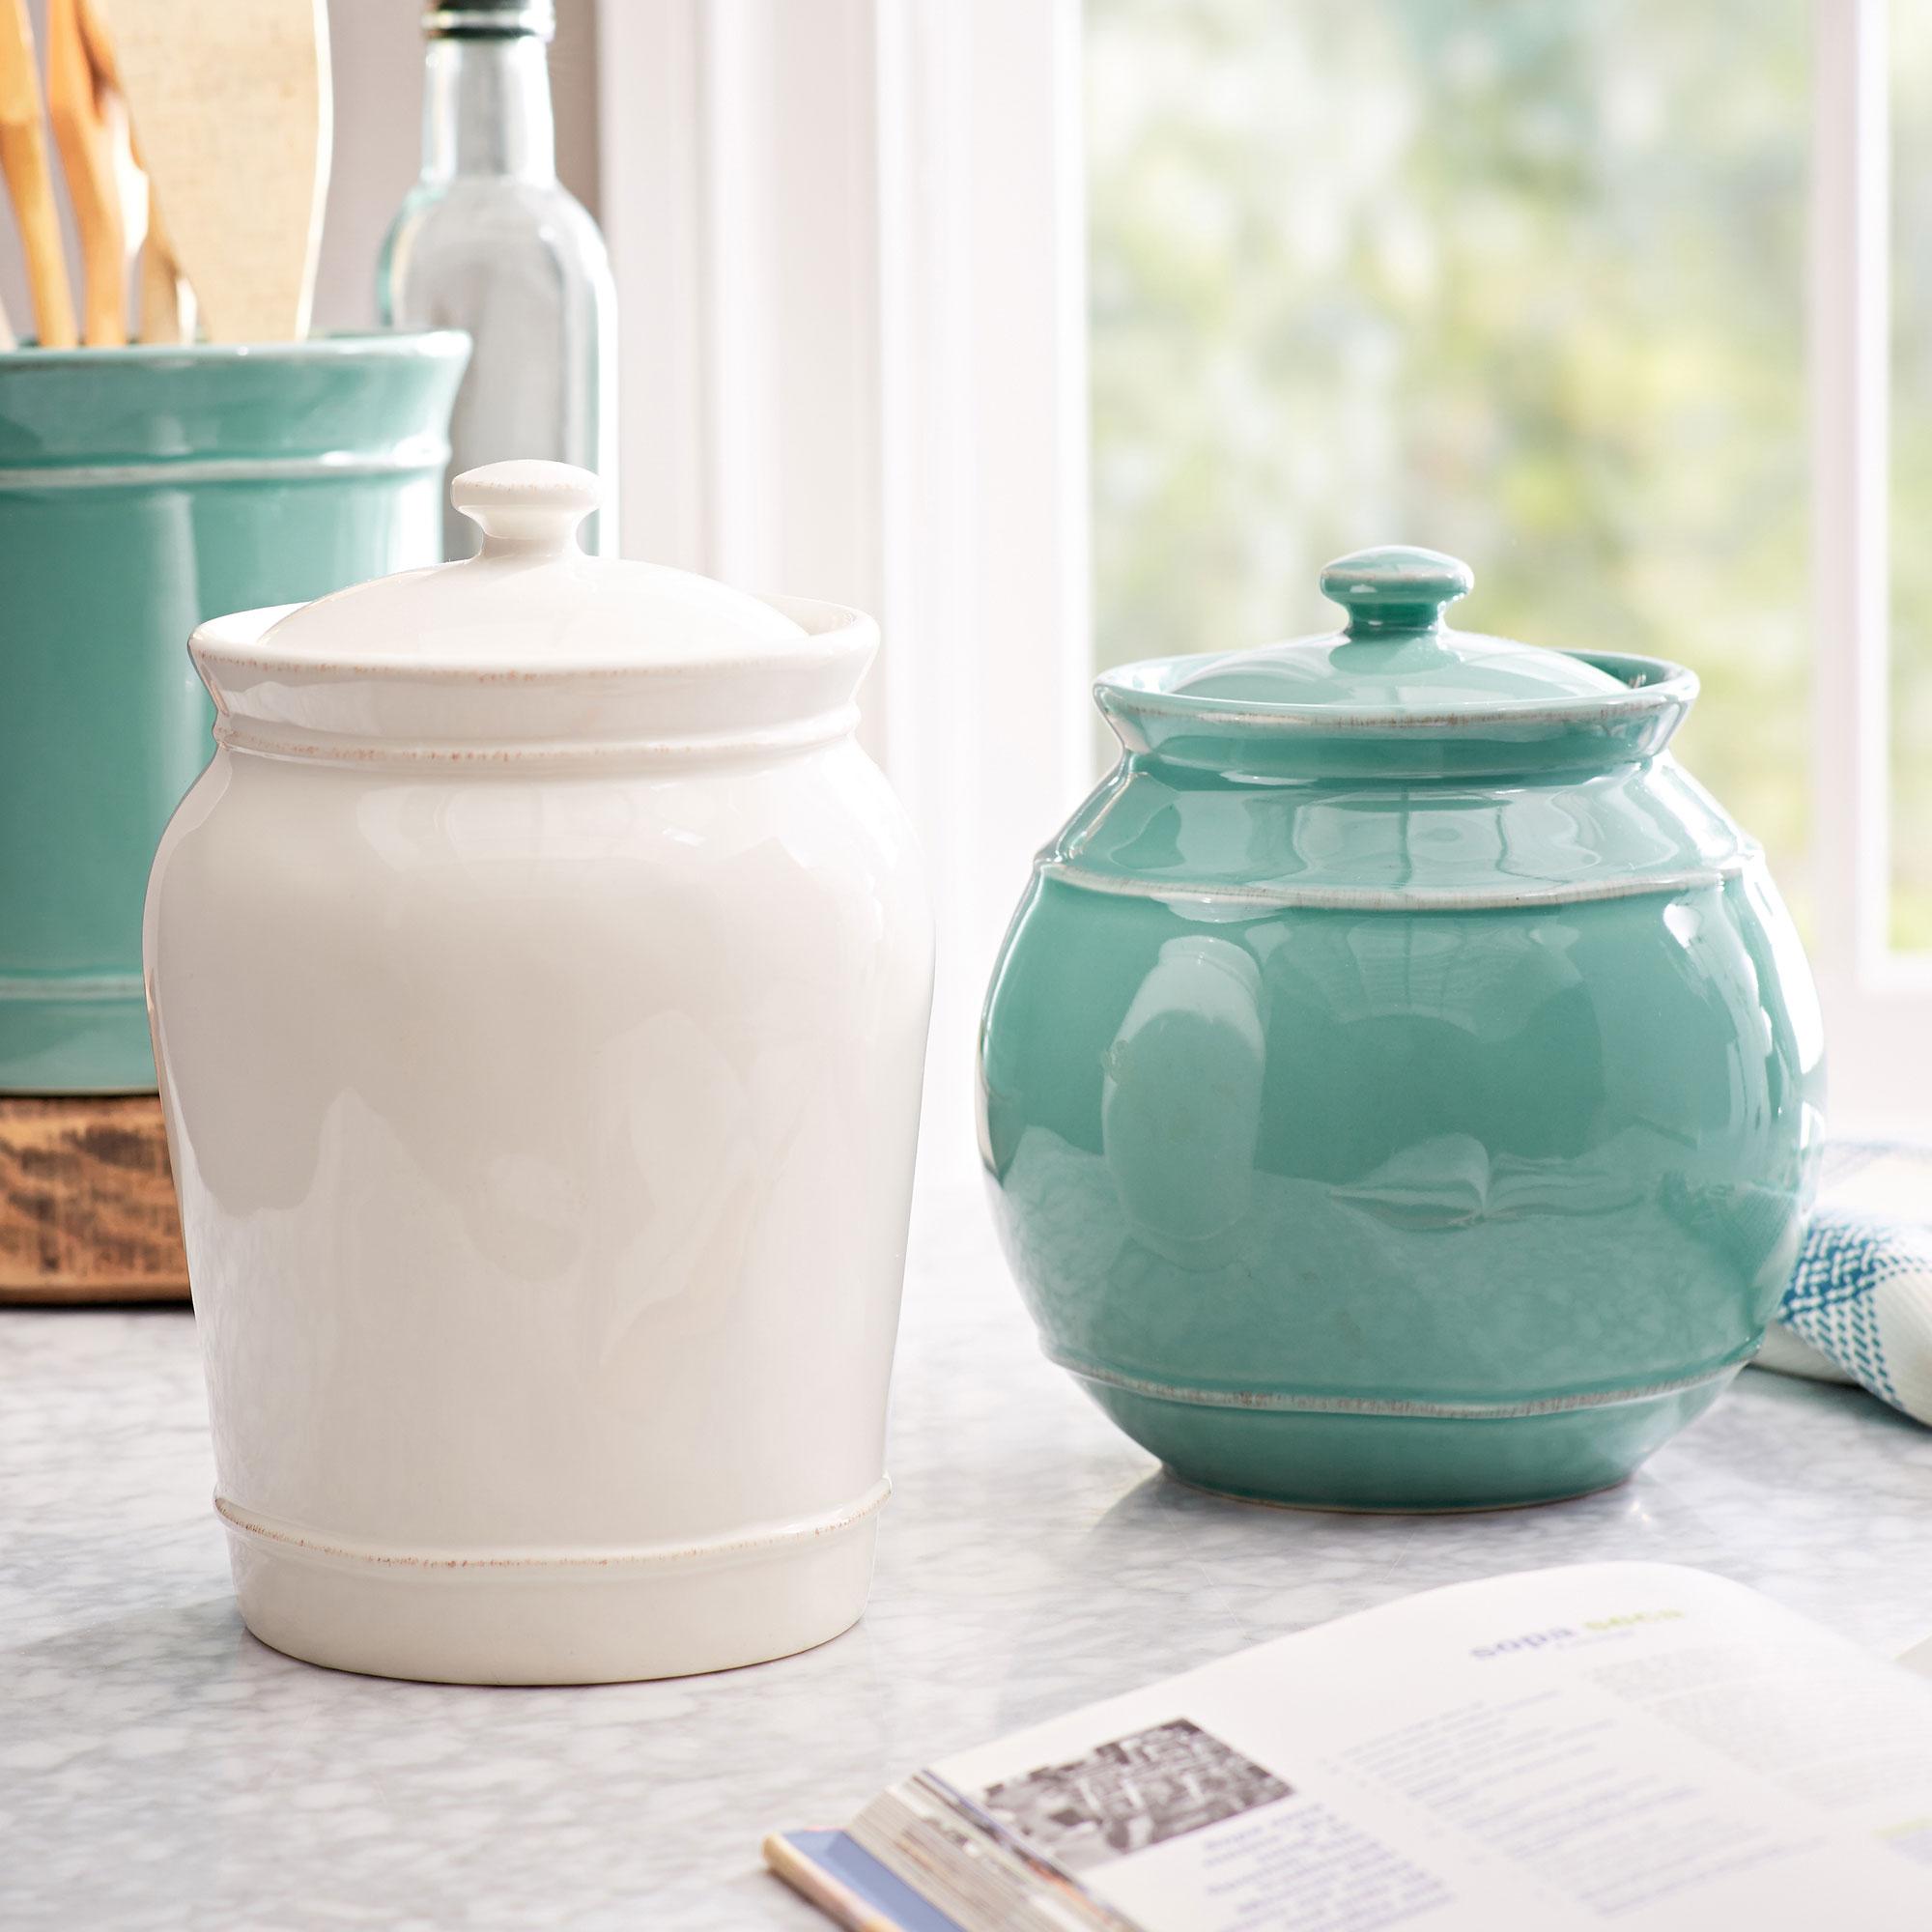 7 Smart Ideas for Kitchen Countertop Storage - Sunset Magazine